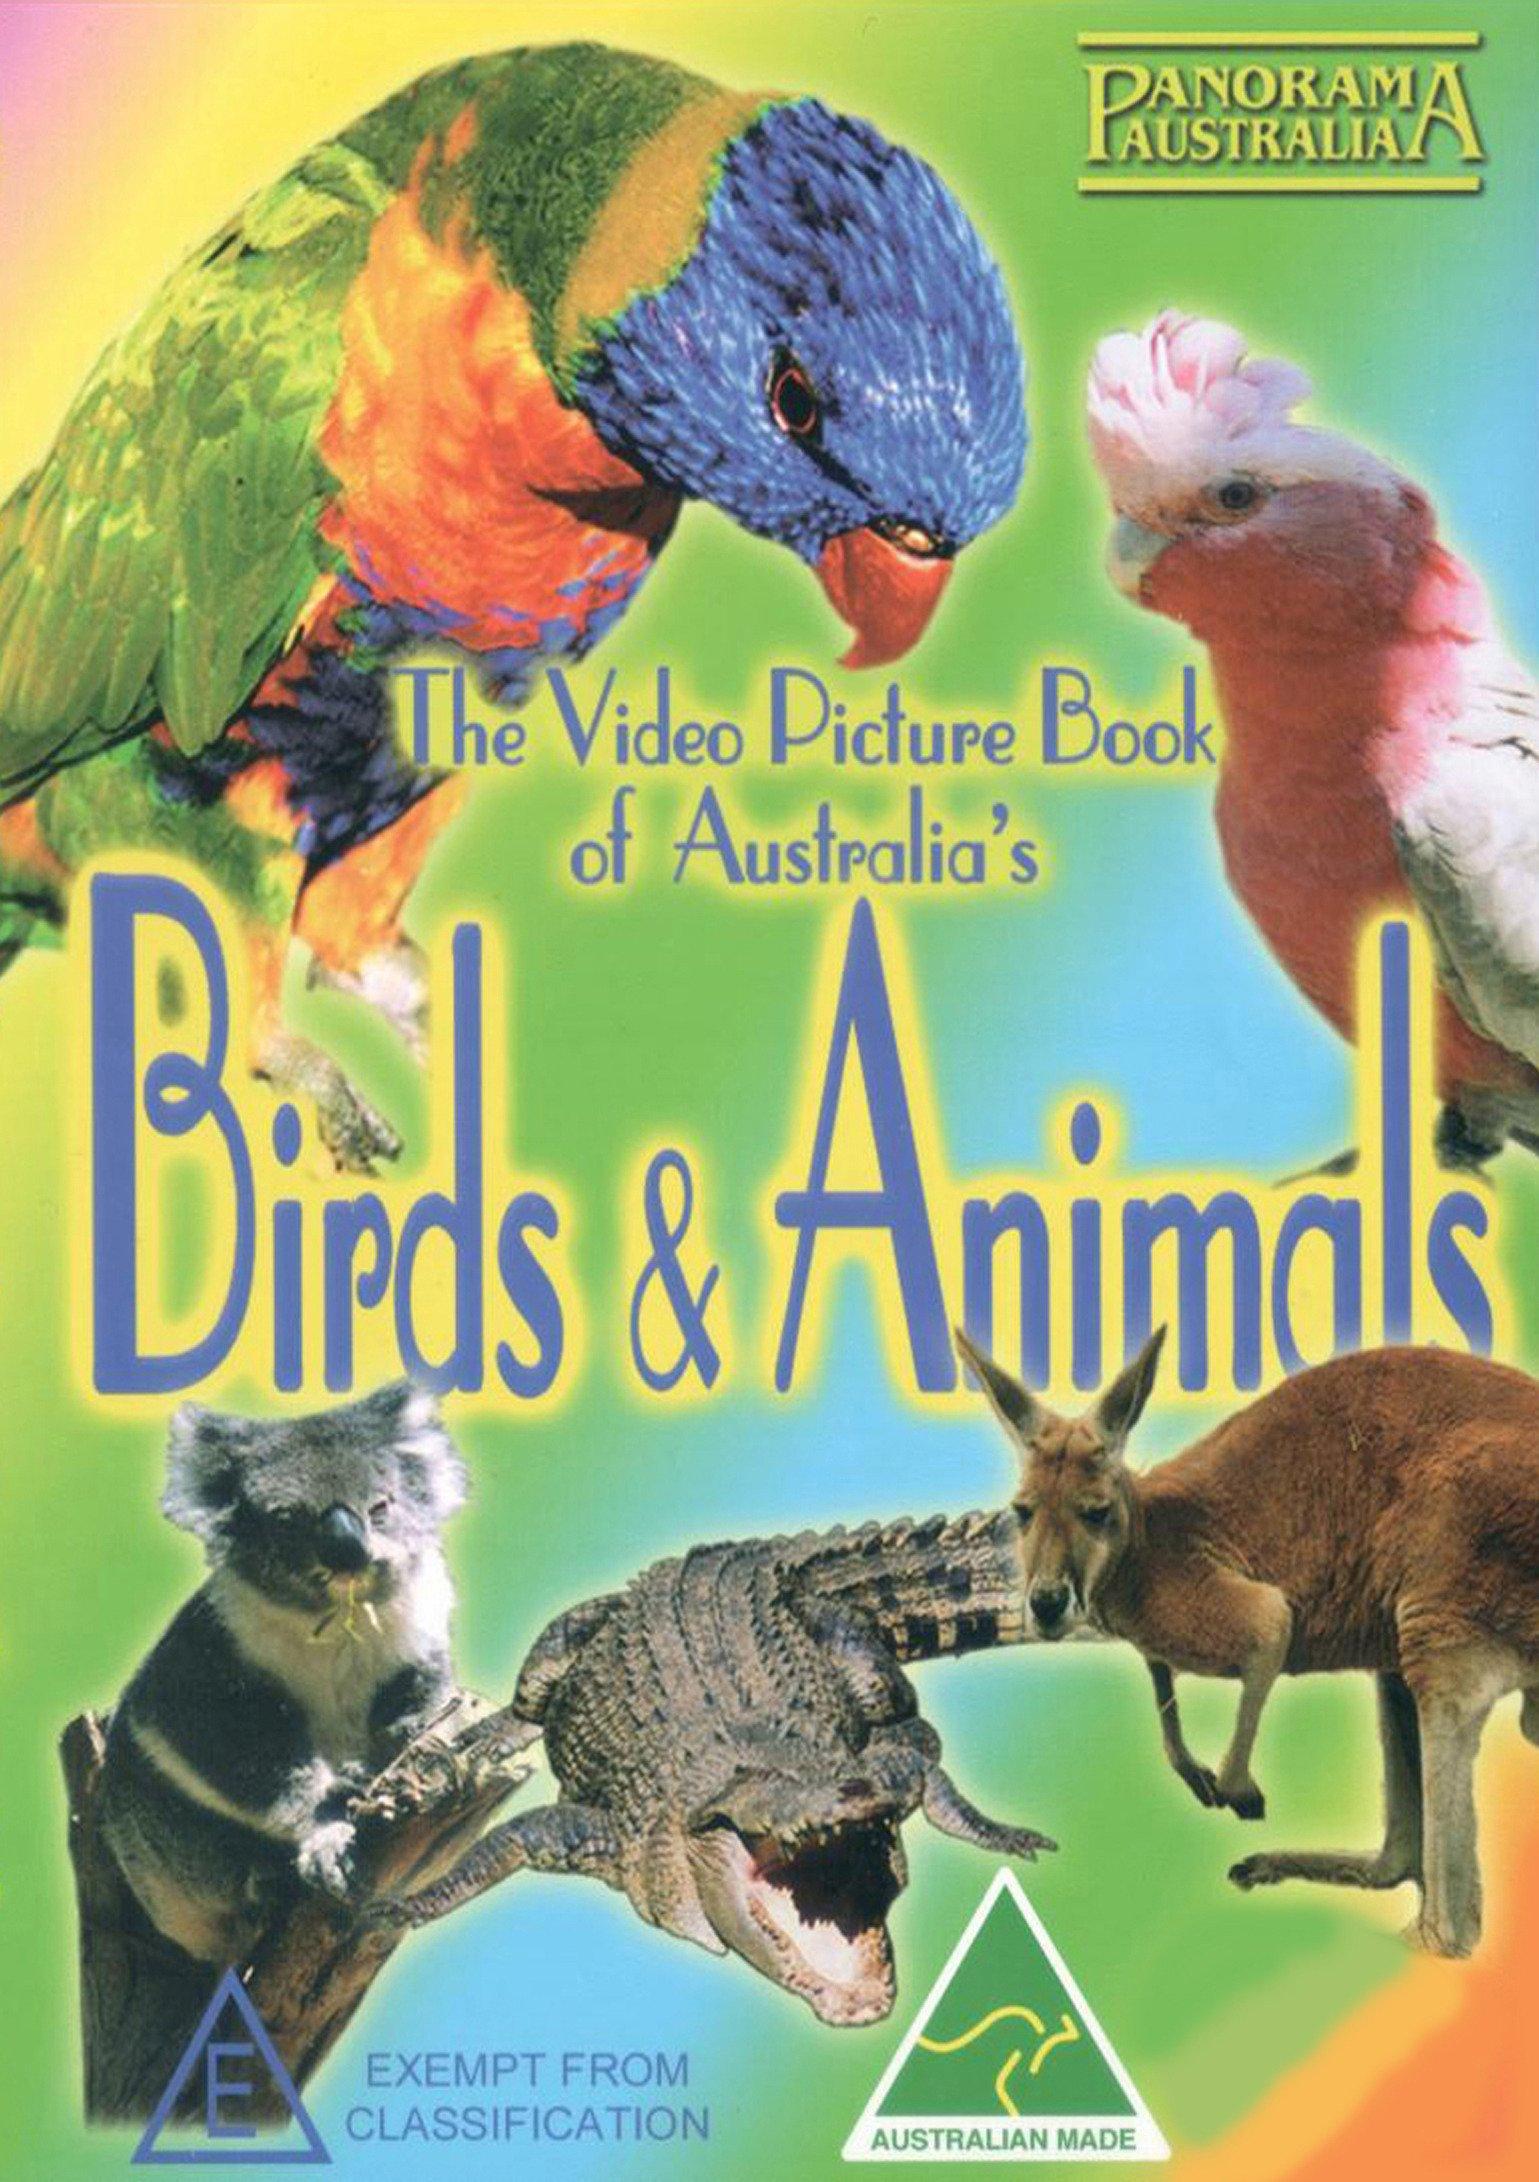 Australia's Birds & Animals